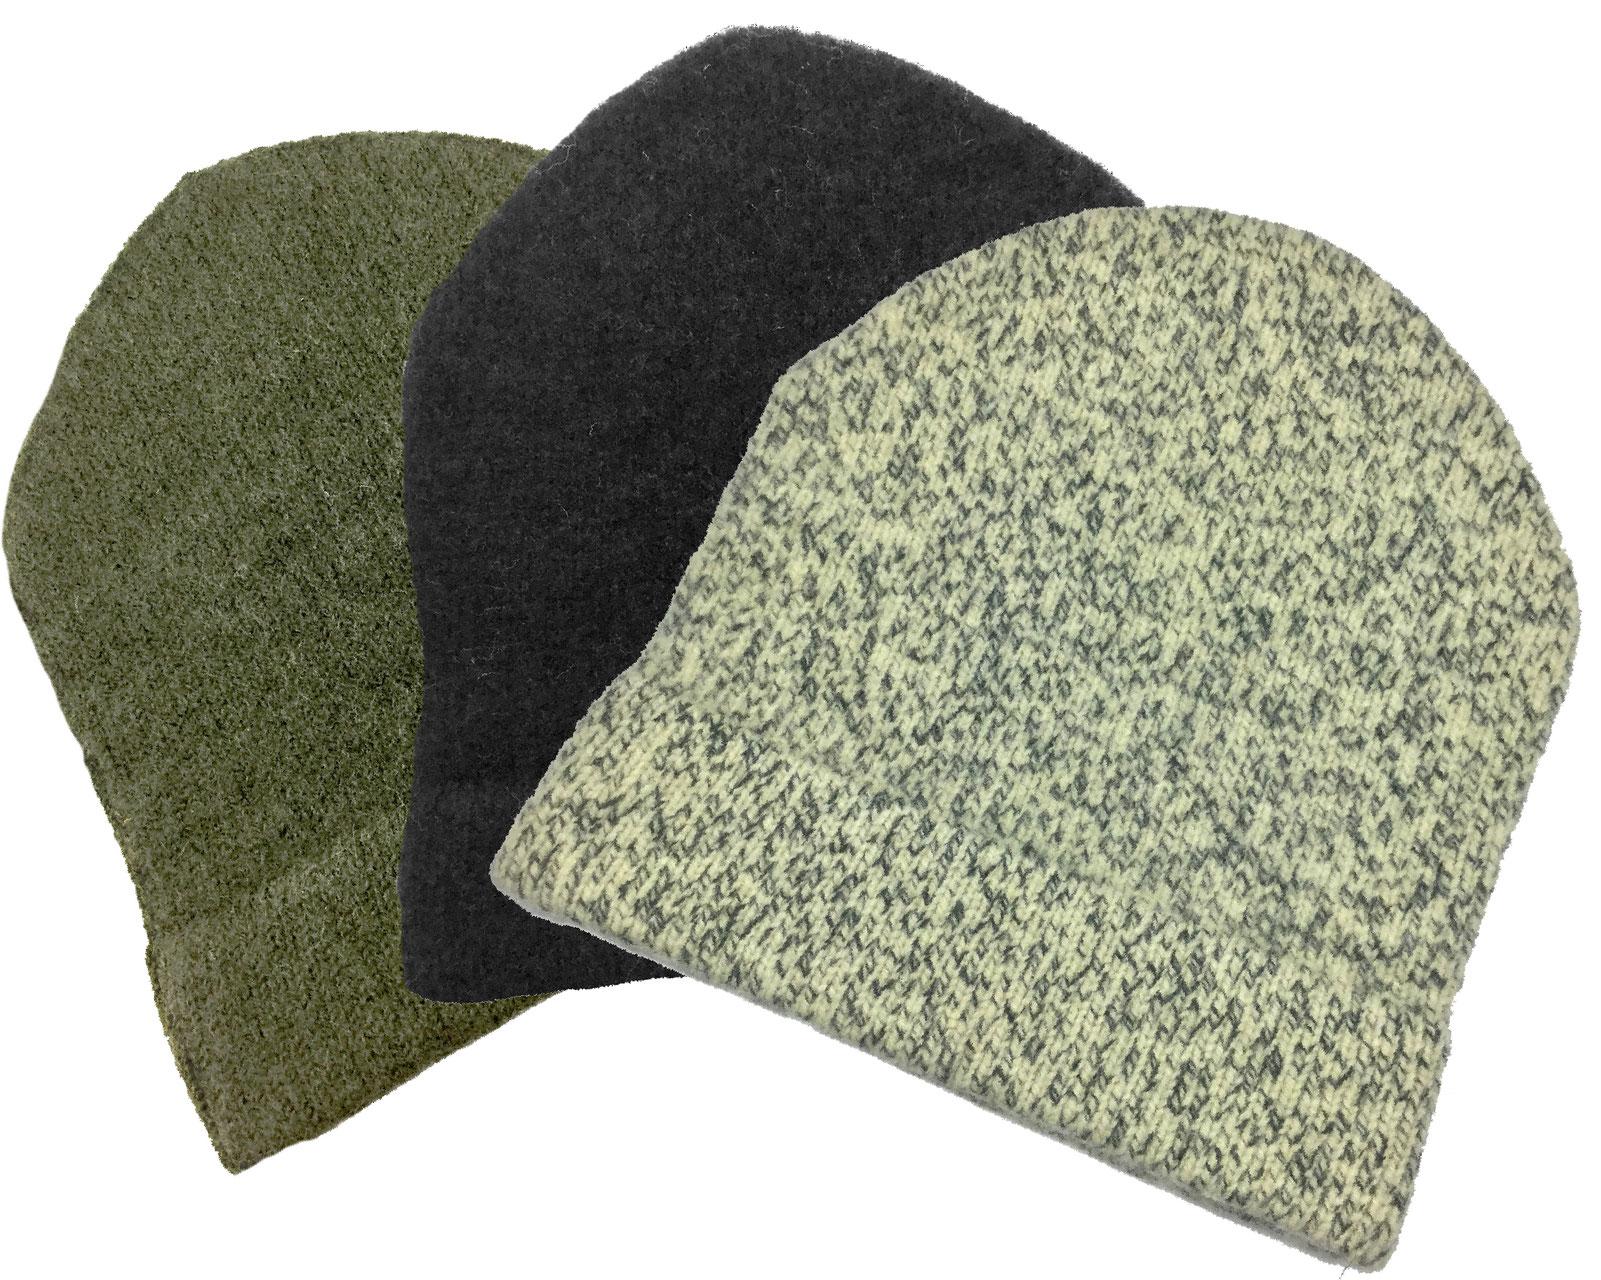 6033e2e7bd4 100% Norwegian Wool Cap from Austria. Dachstein XL Alpine Caps